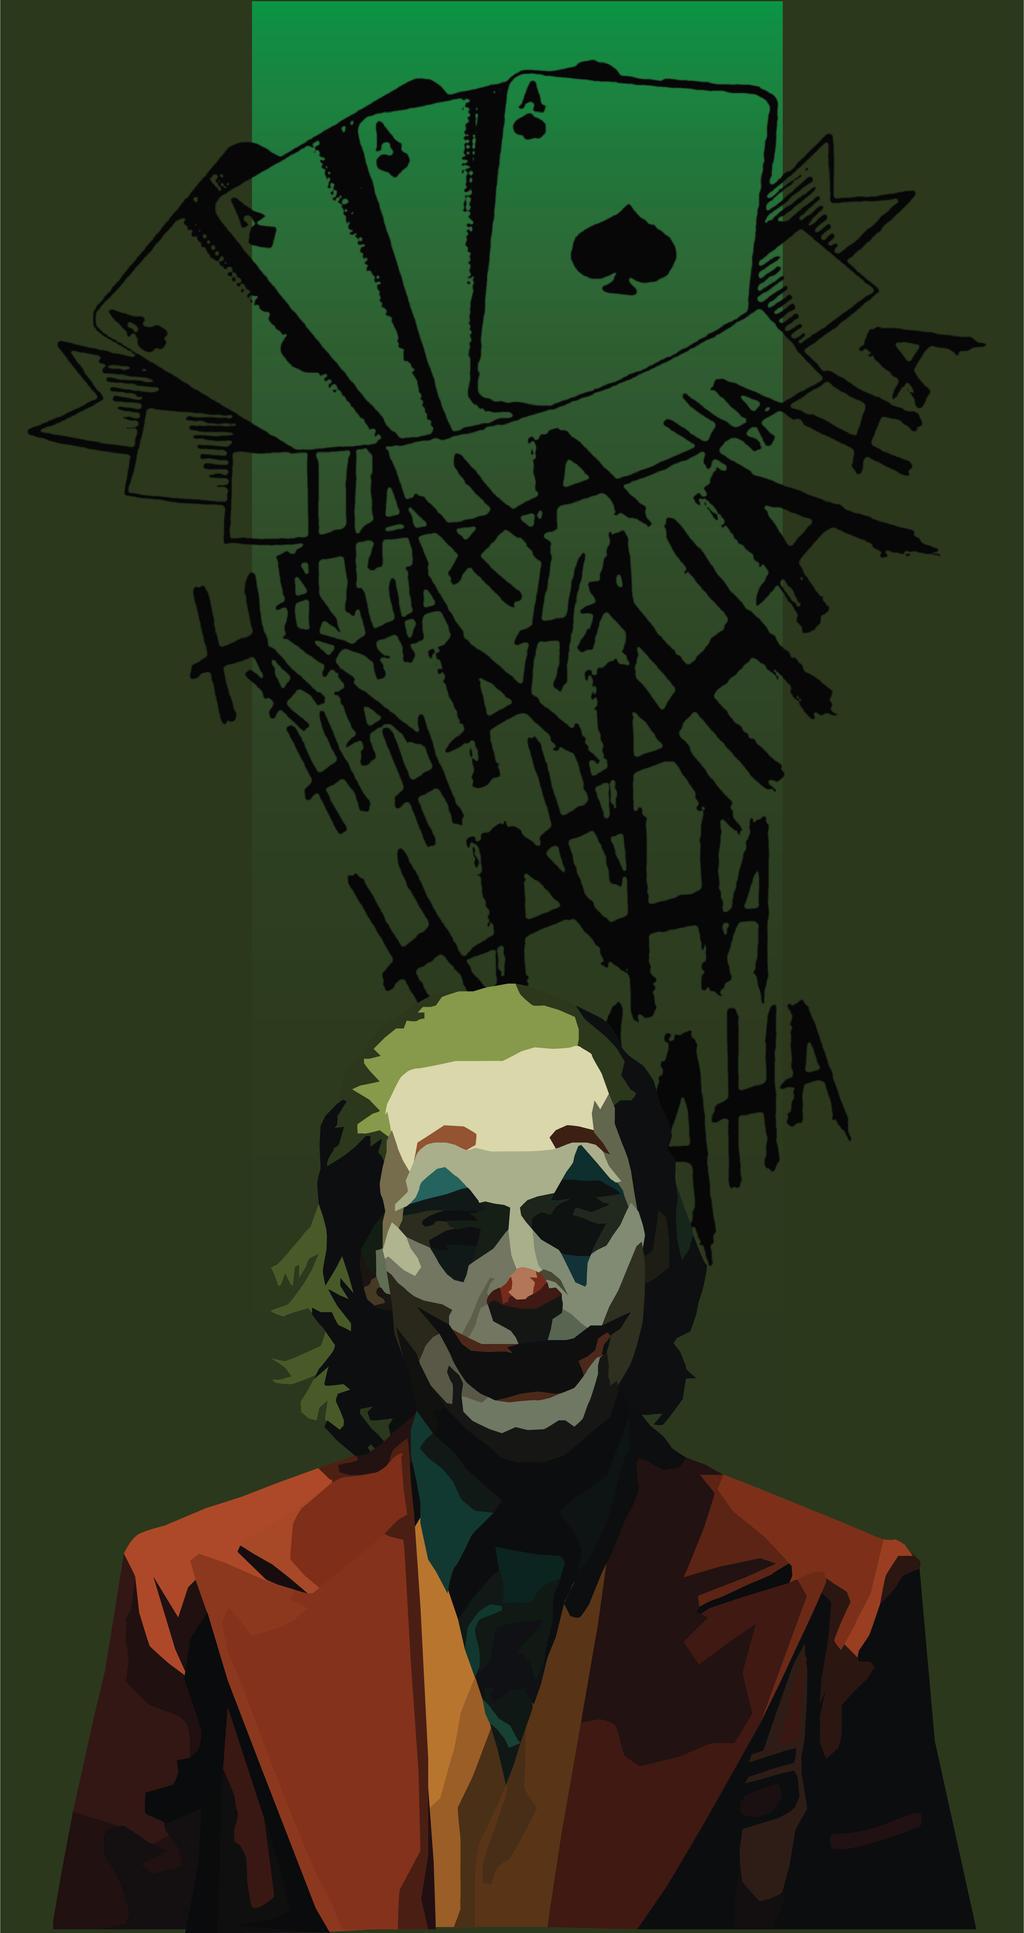 The Joker Joaquin Phoenix By Doomw123 On Deviantart